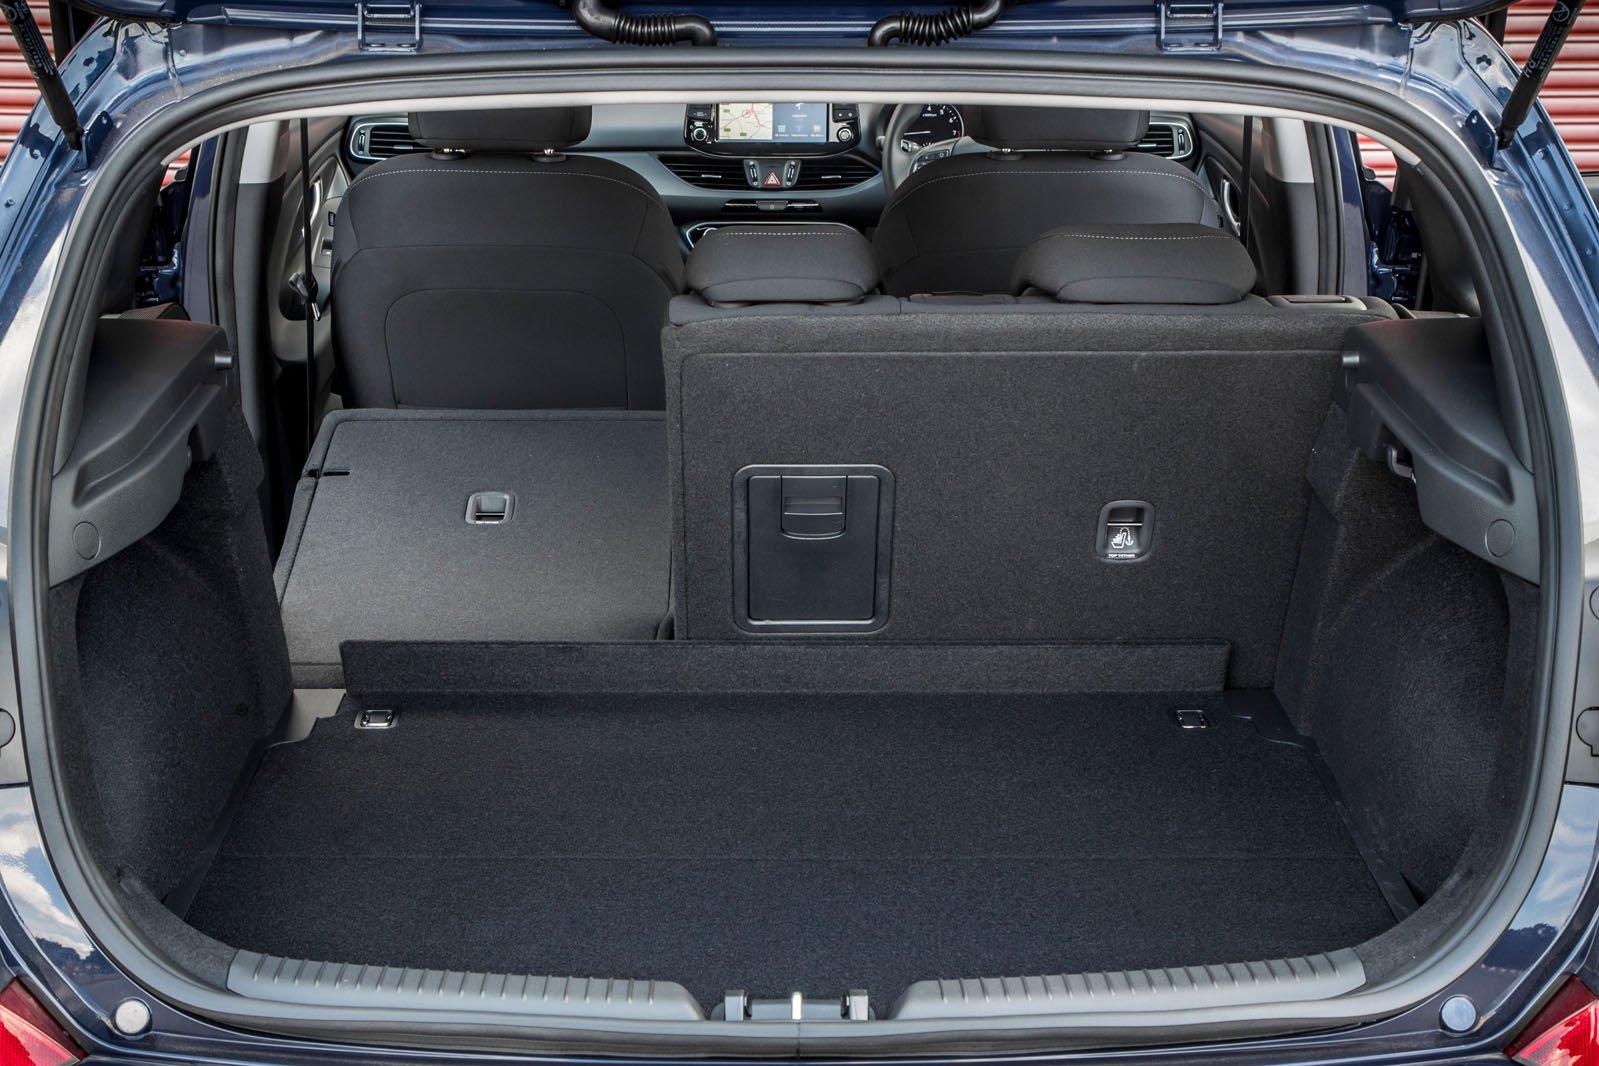 Hyundai i30 2019 RHD boot open